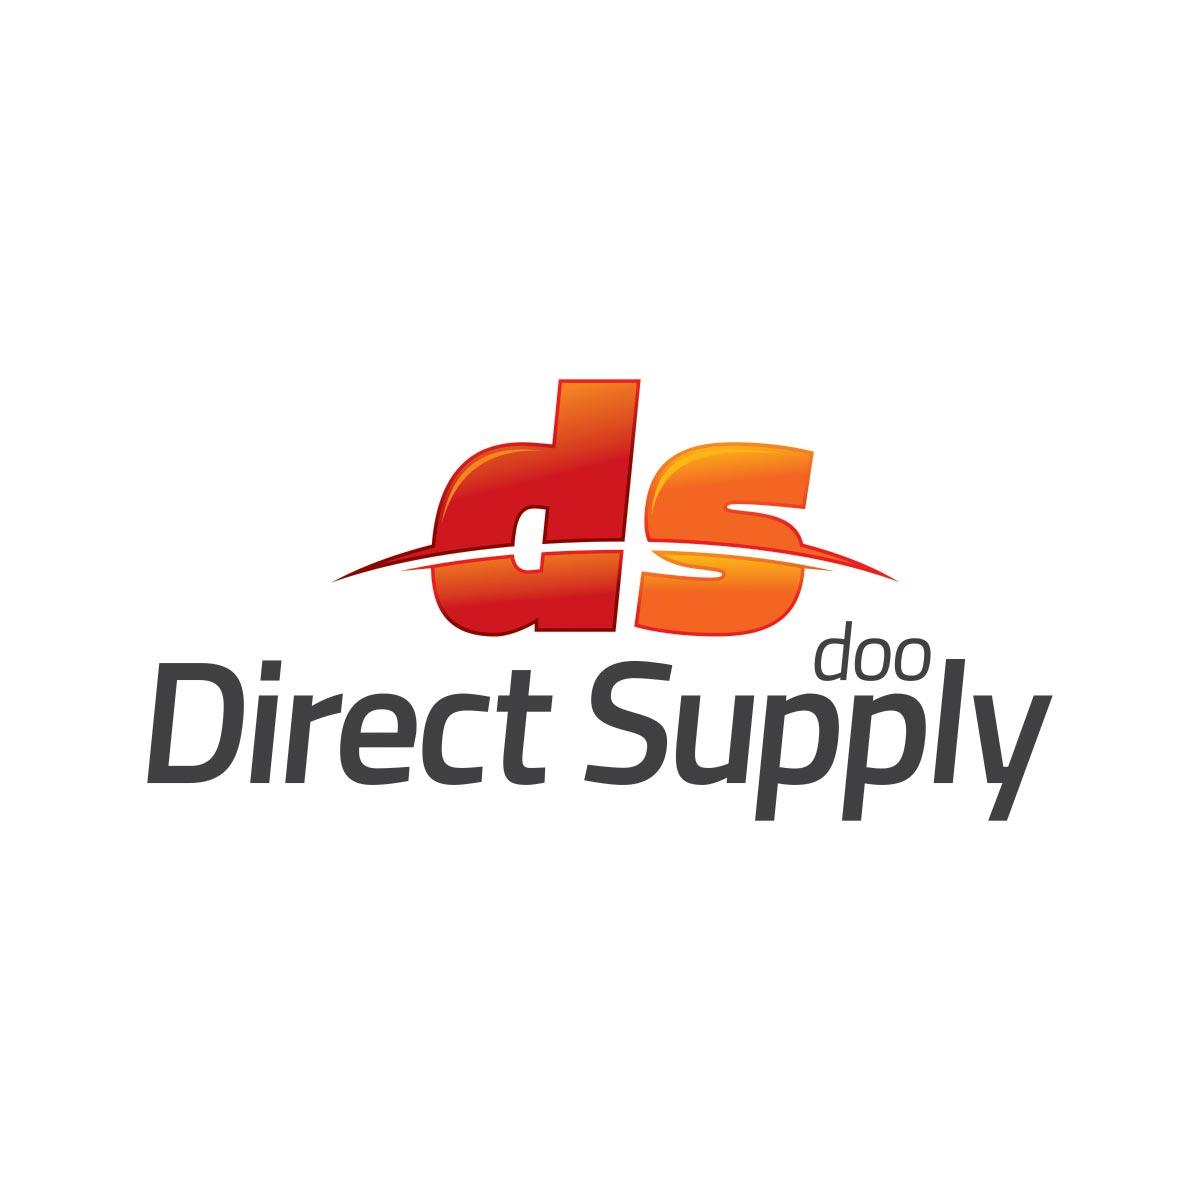 Direct Supply logo design